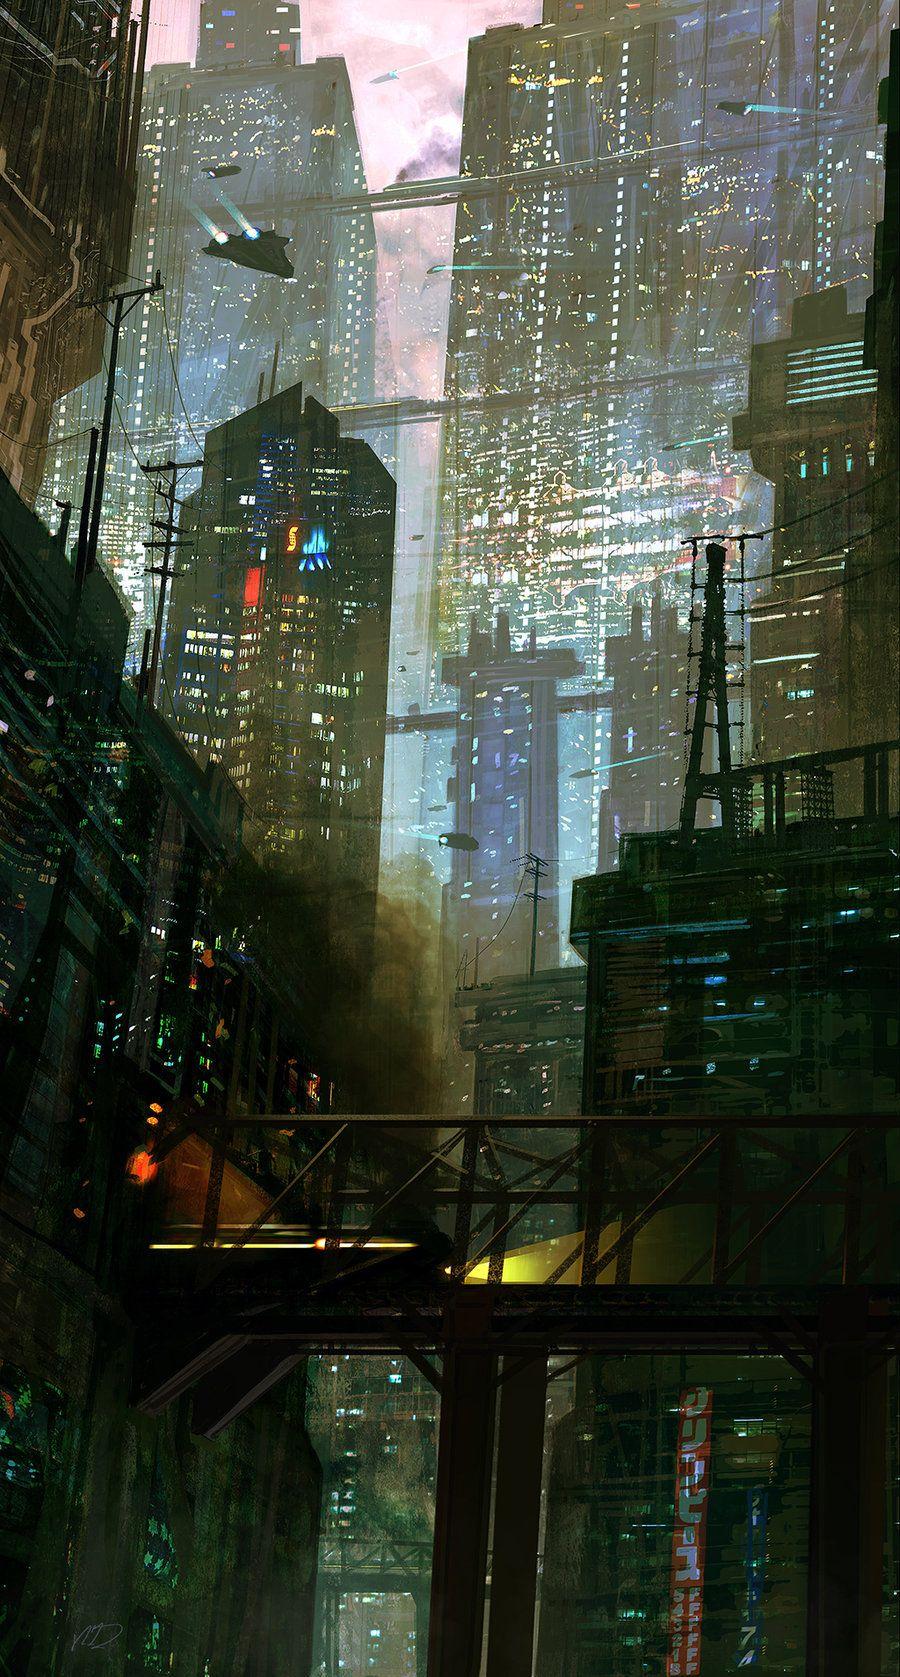 Epingle Par Jessica Min Sur Bric A Brac Art Futuriste Art Cyberpunk Ville Cyberpunk